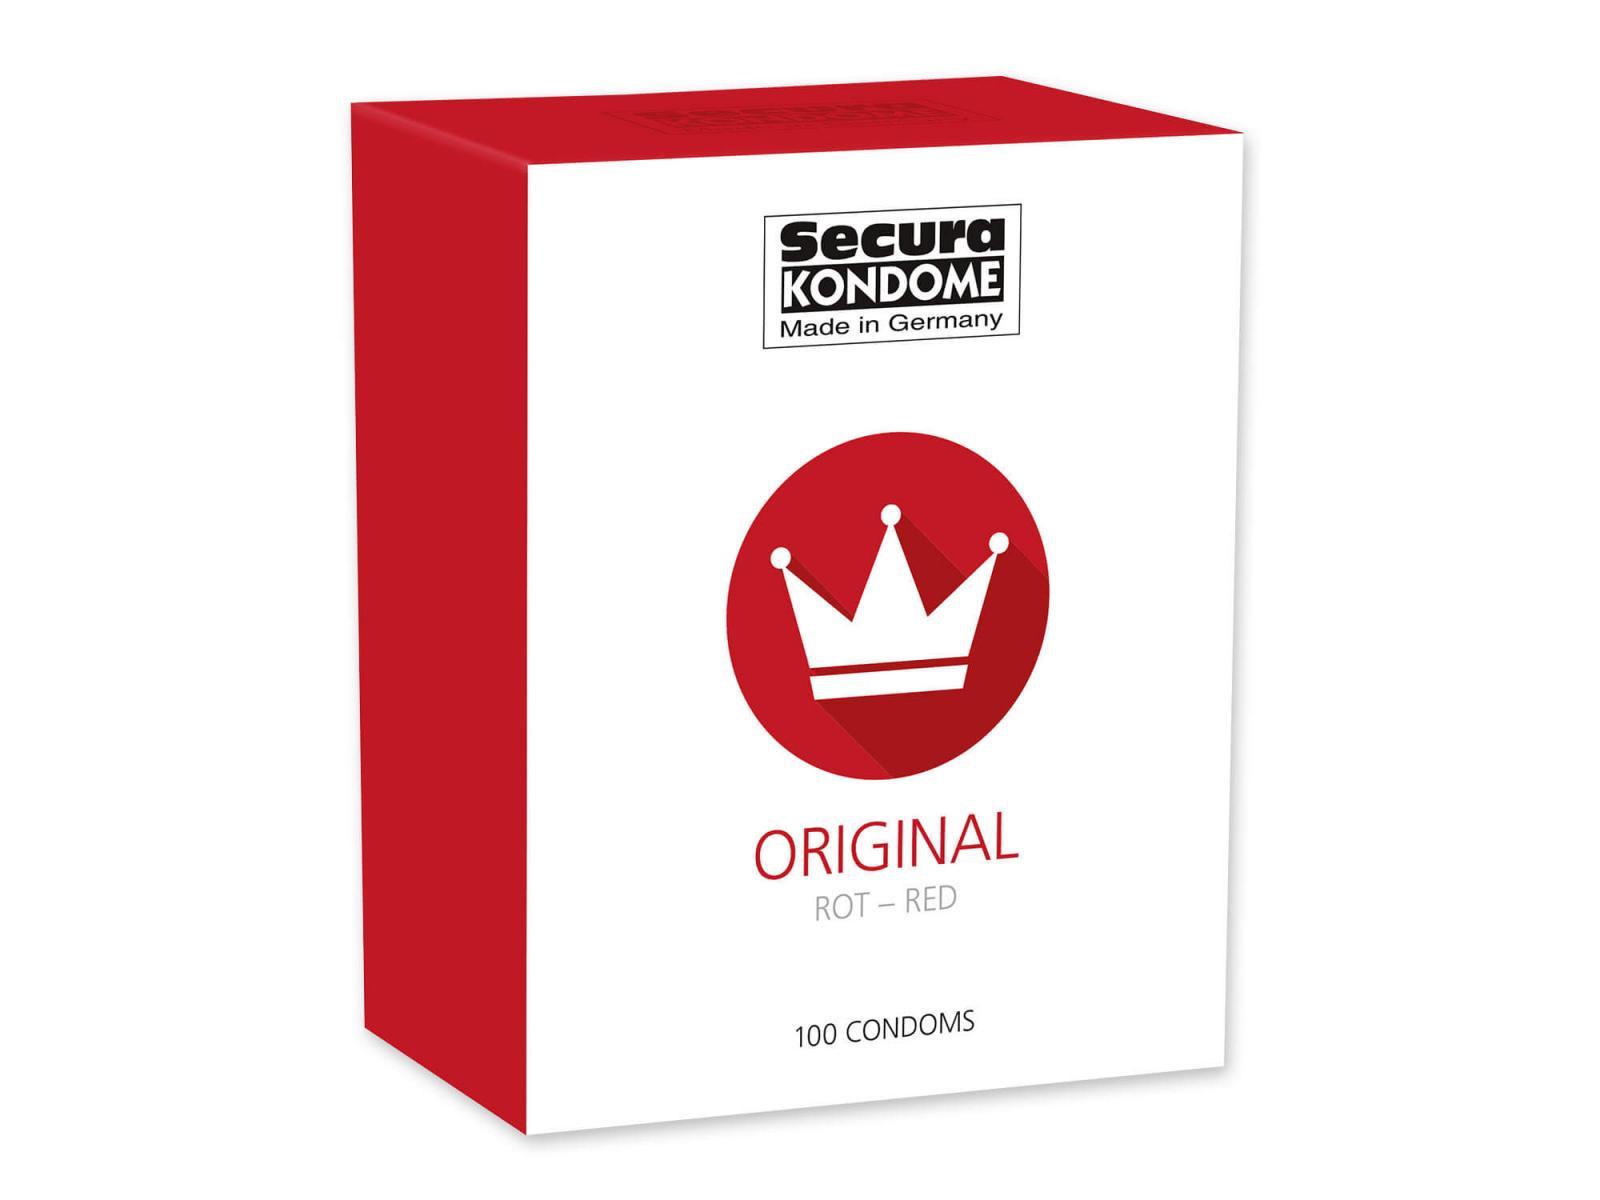 100er Packung Secura Red rote Kondome